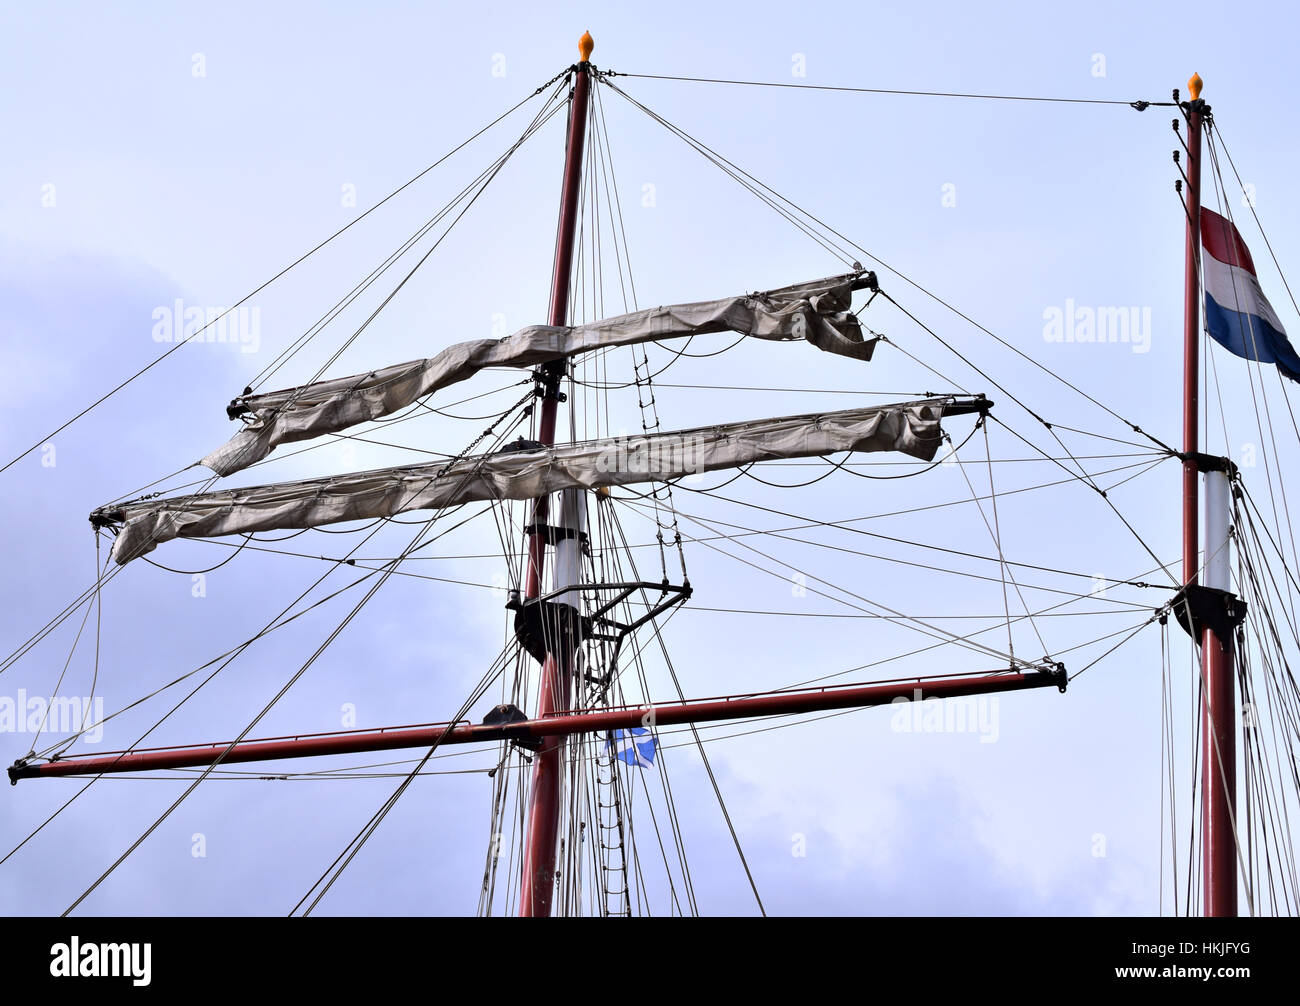 Flying Dutchman sail mast - Stock Image